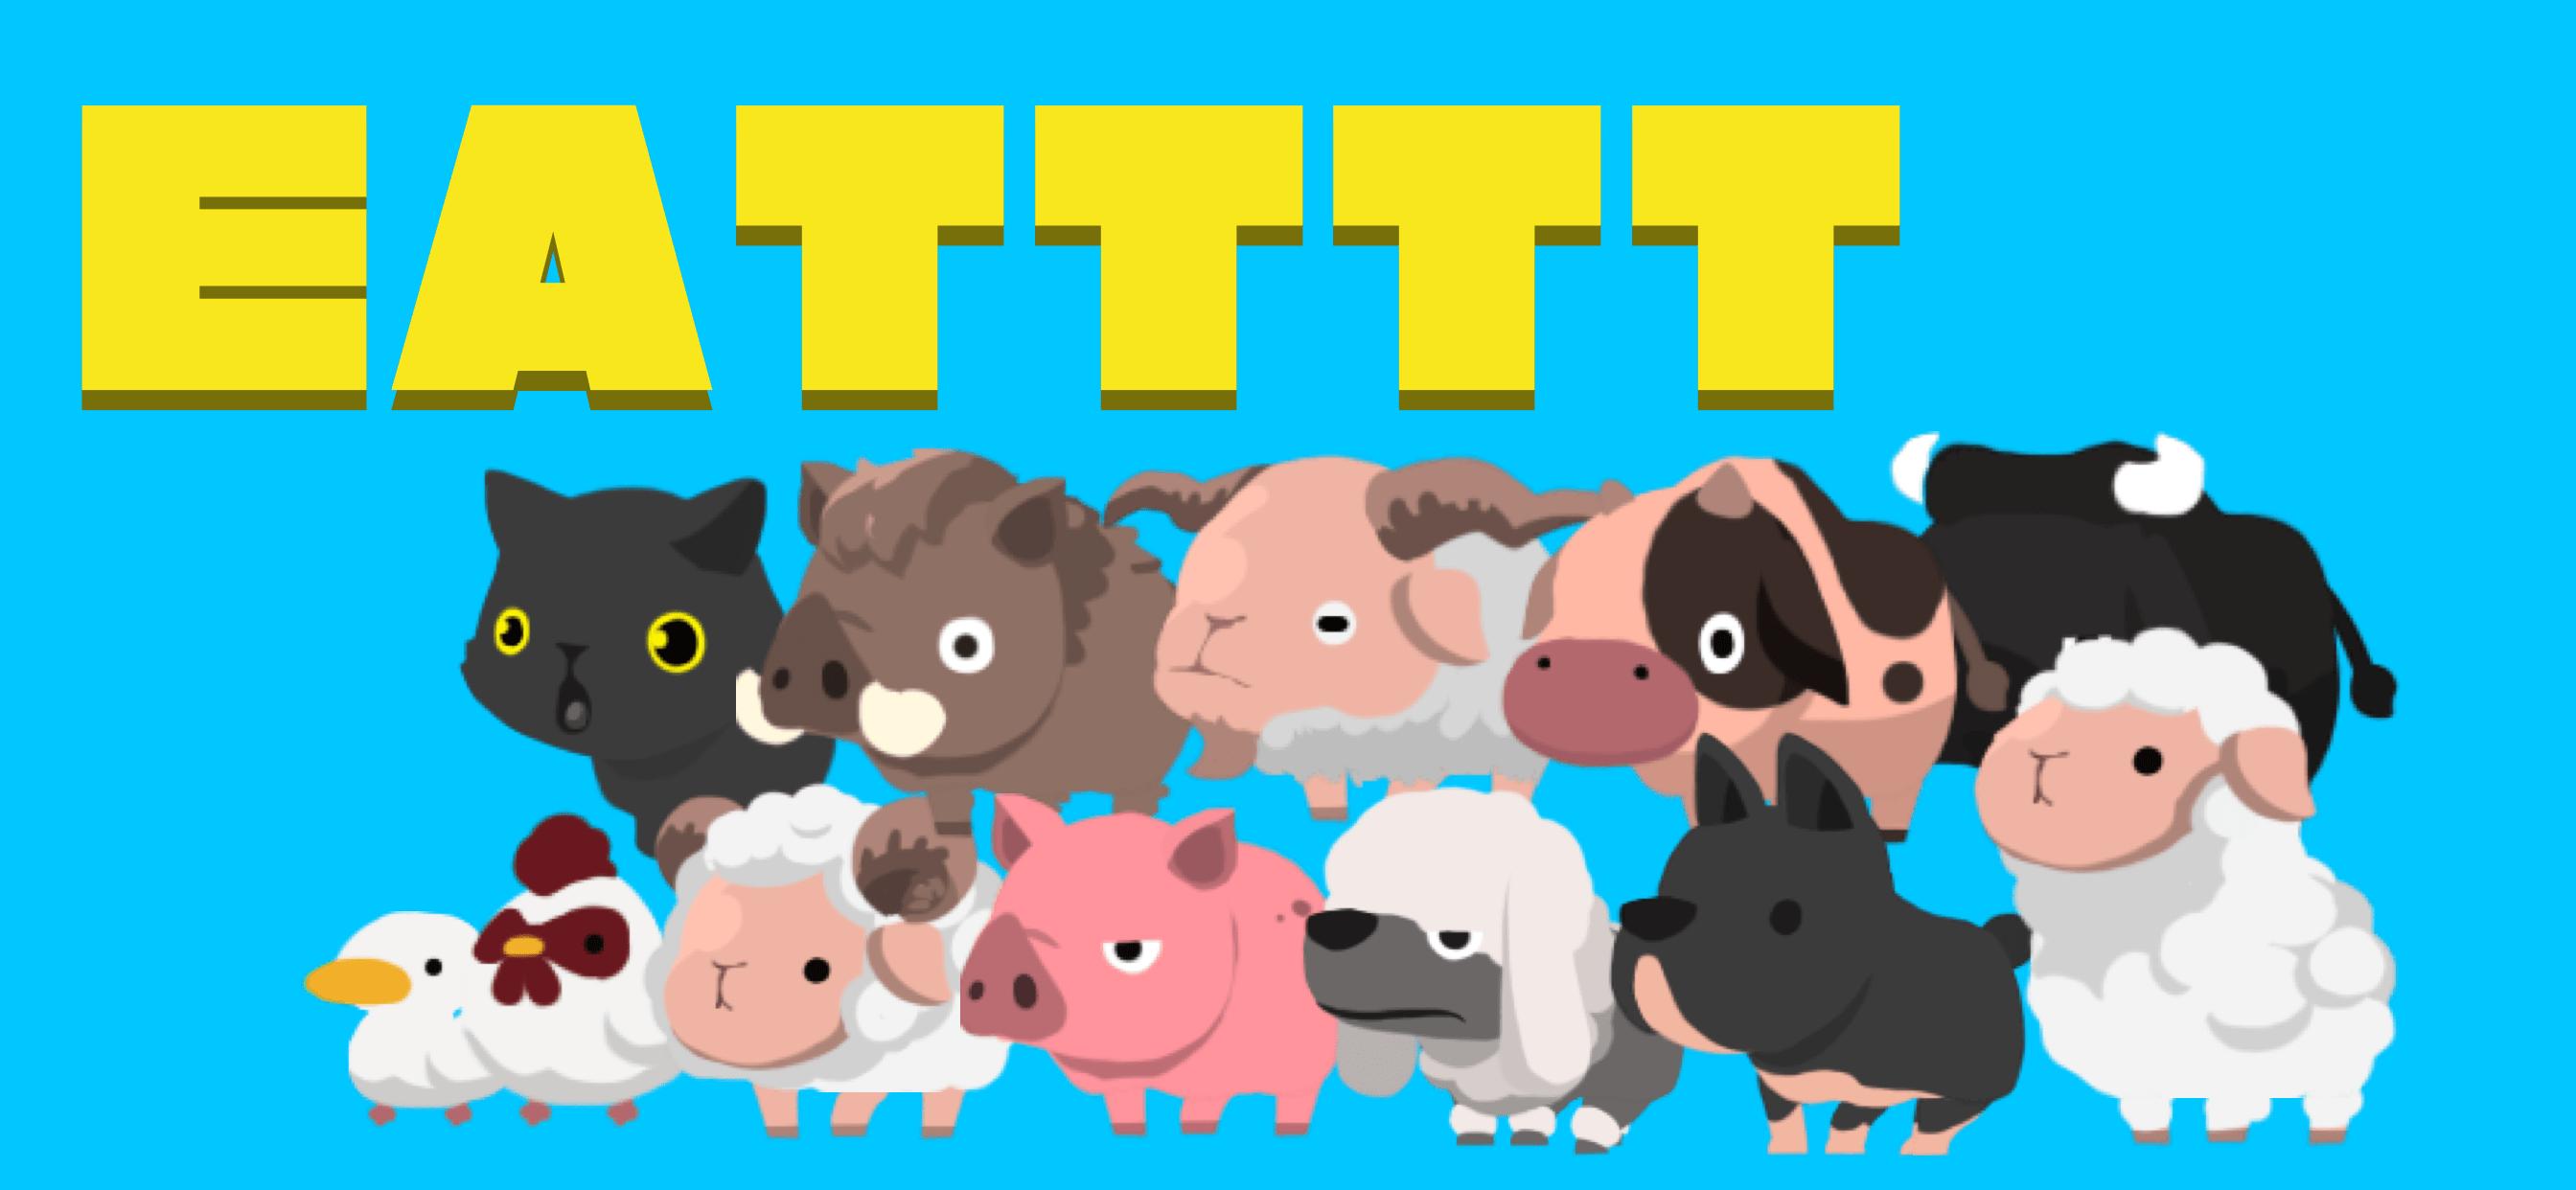 EATTTT – パズルでペットを育てよう